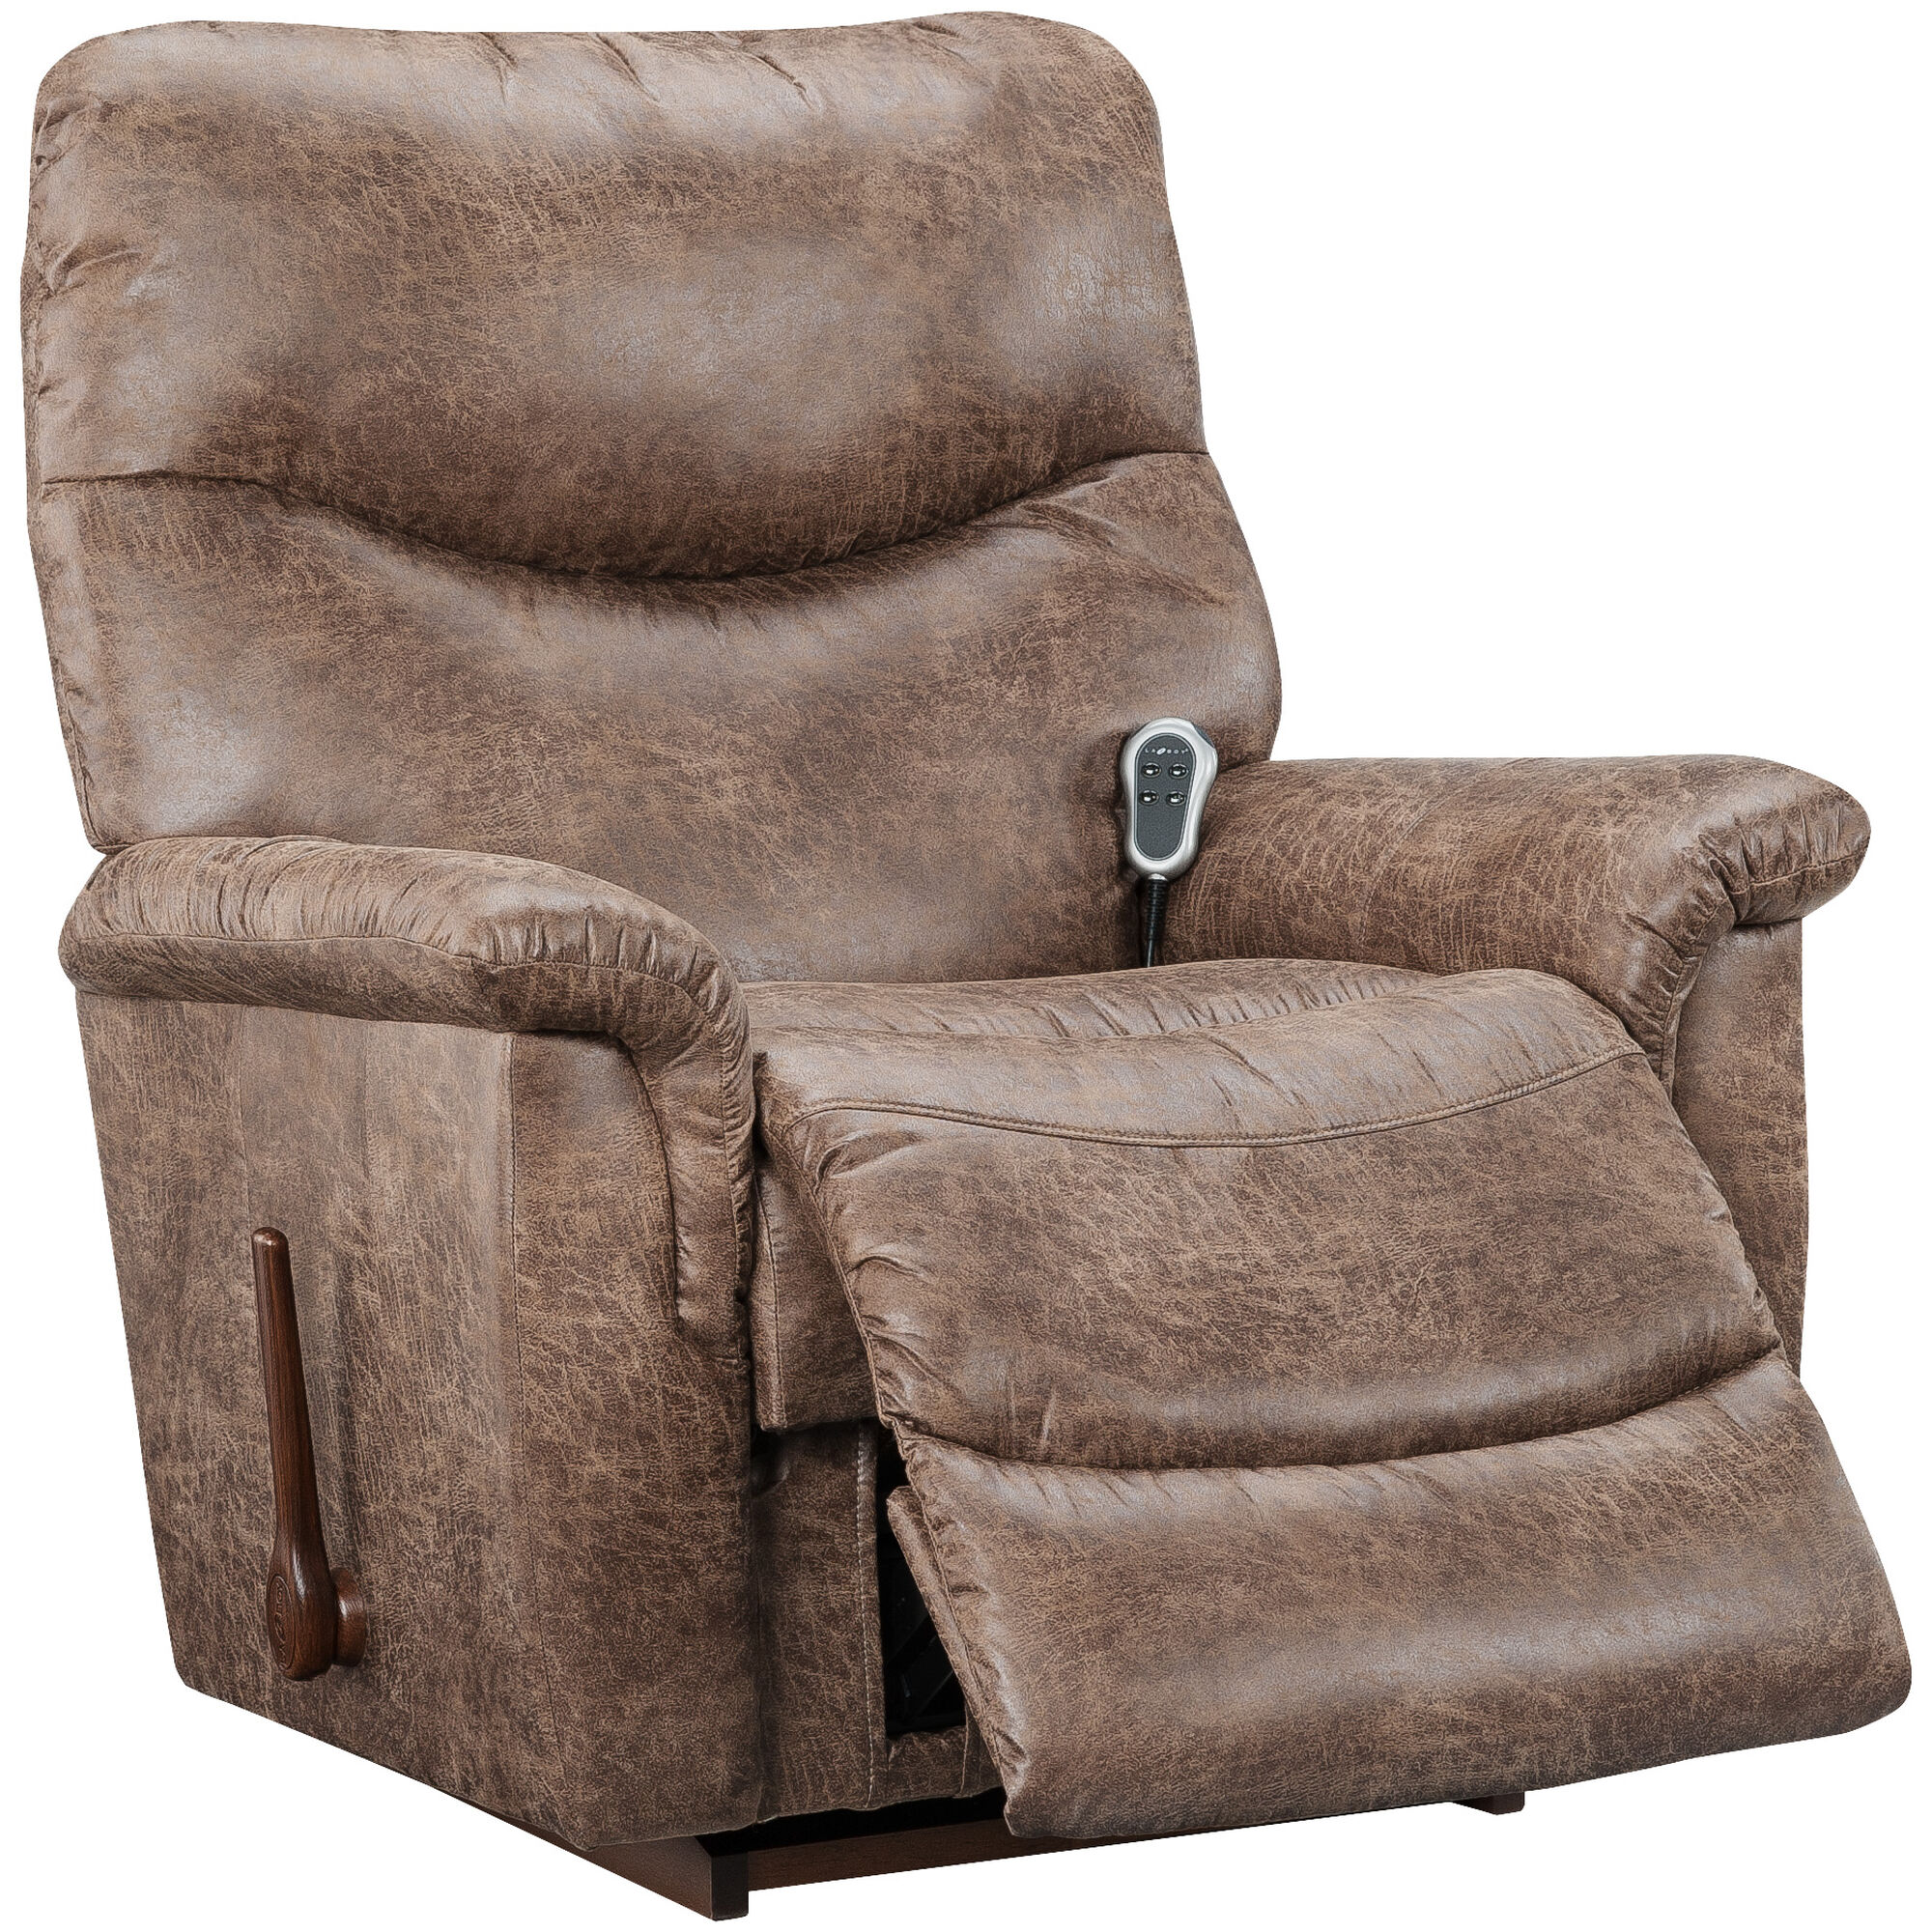 Prime Slumberland Furniture James Silt Heat Massage Recliner Short Links Chair Design For Home Short Linksinfo